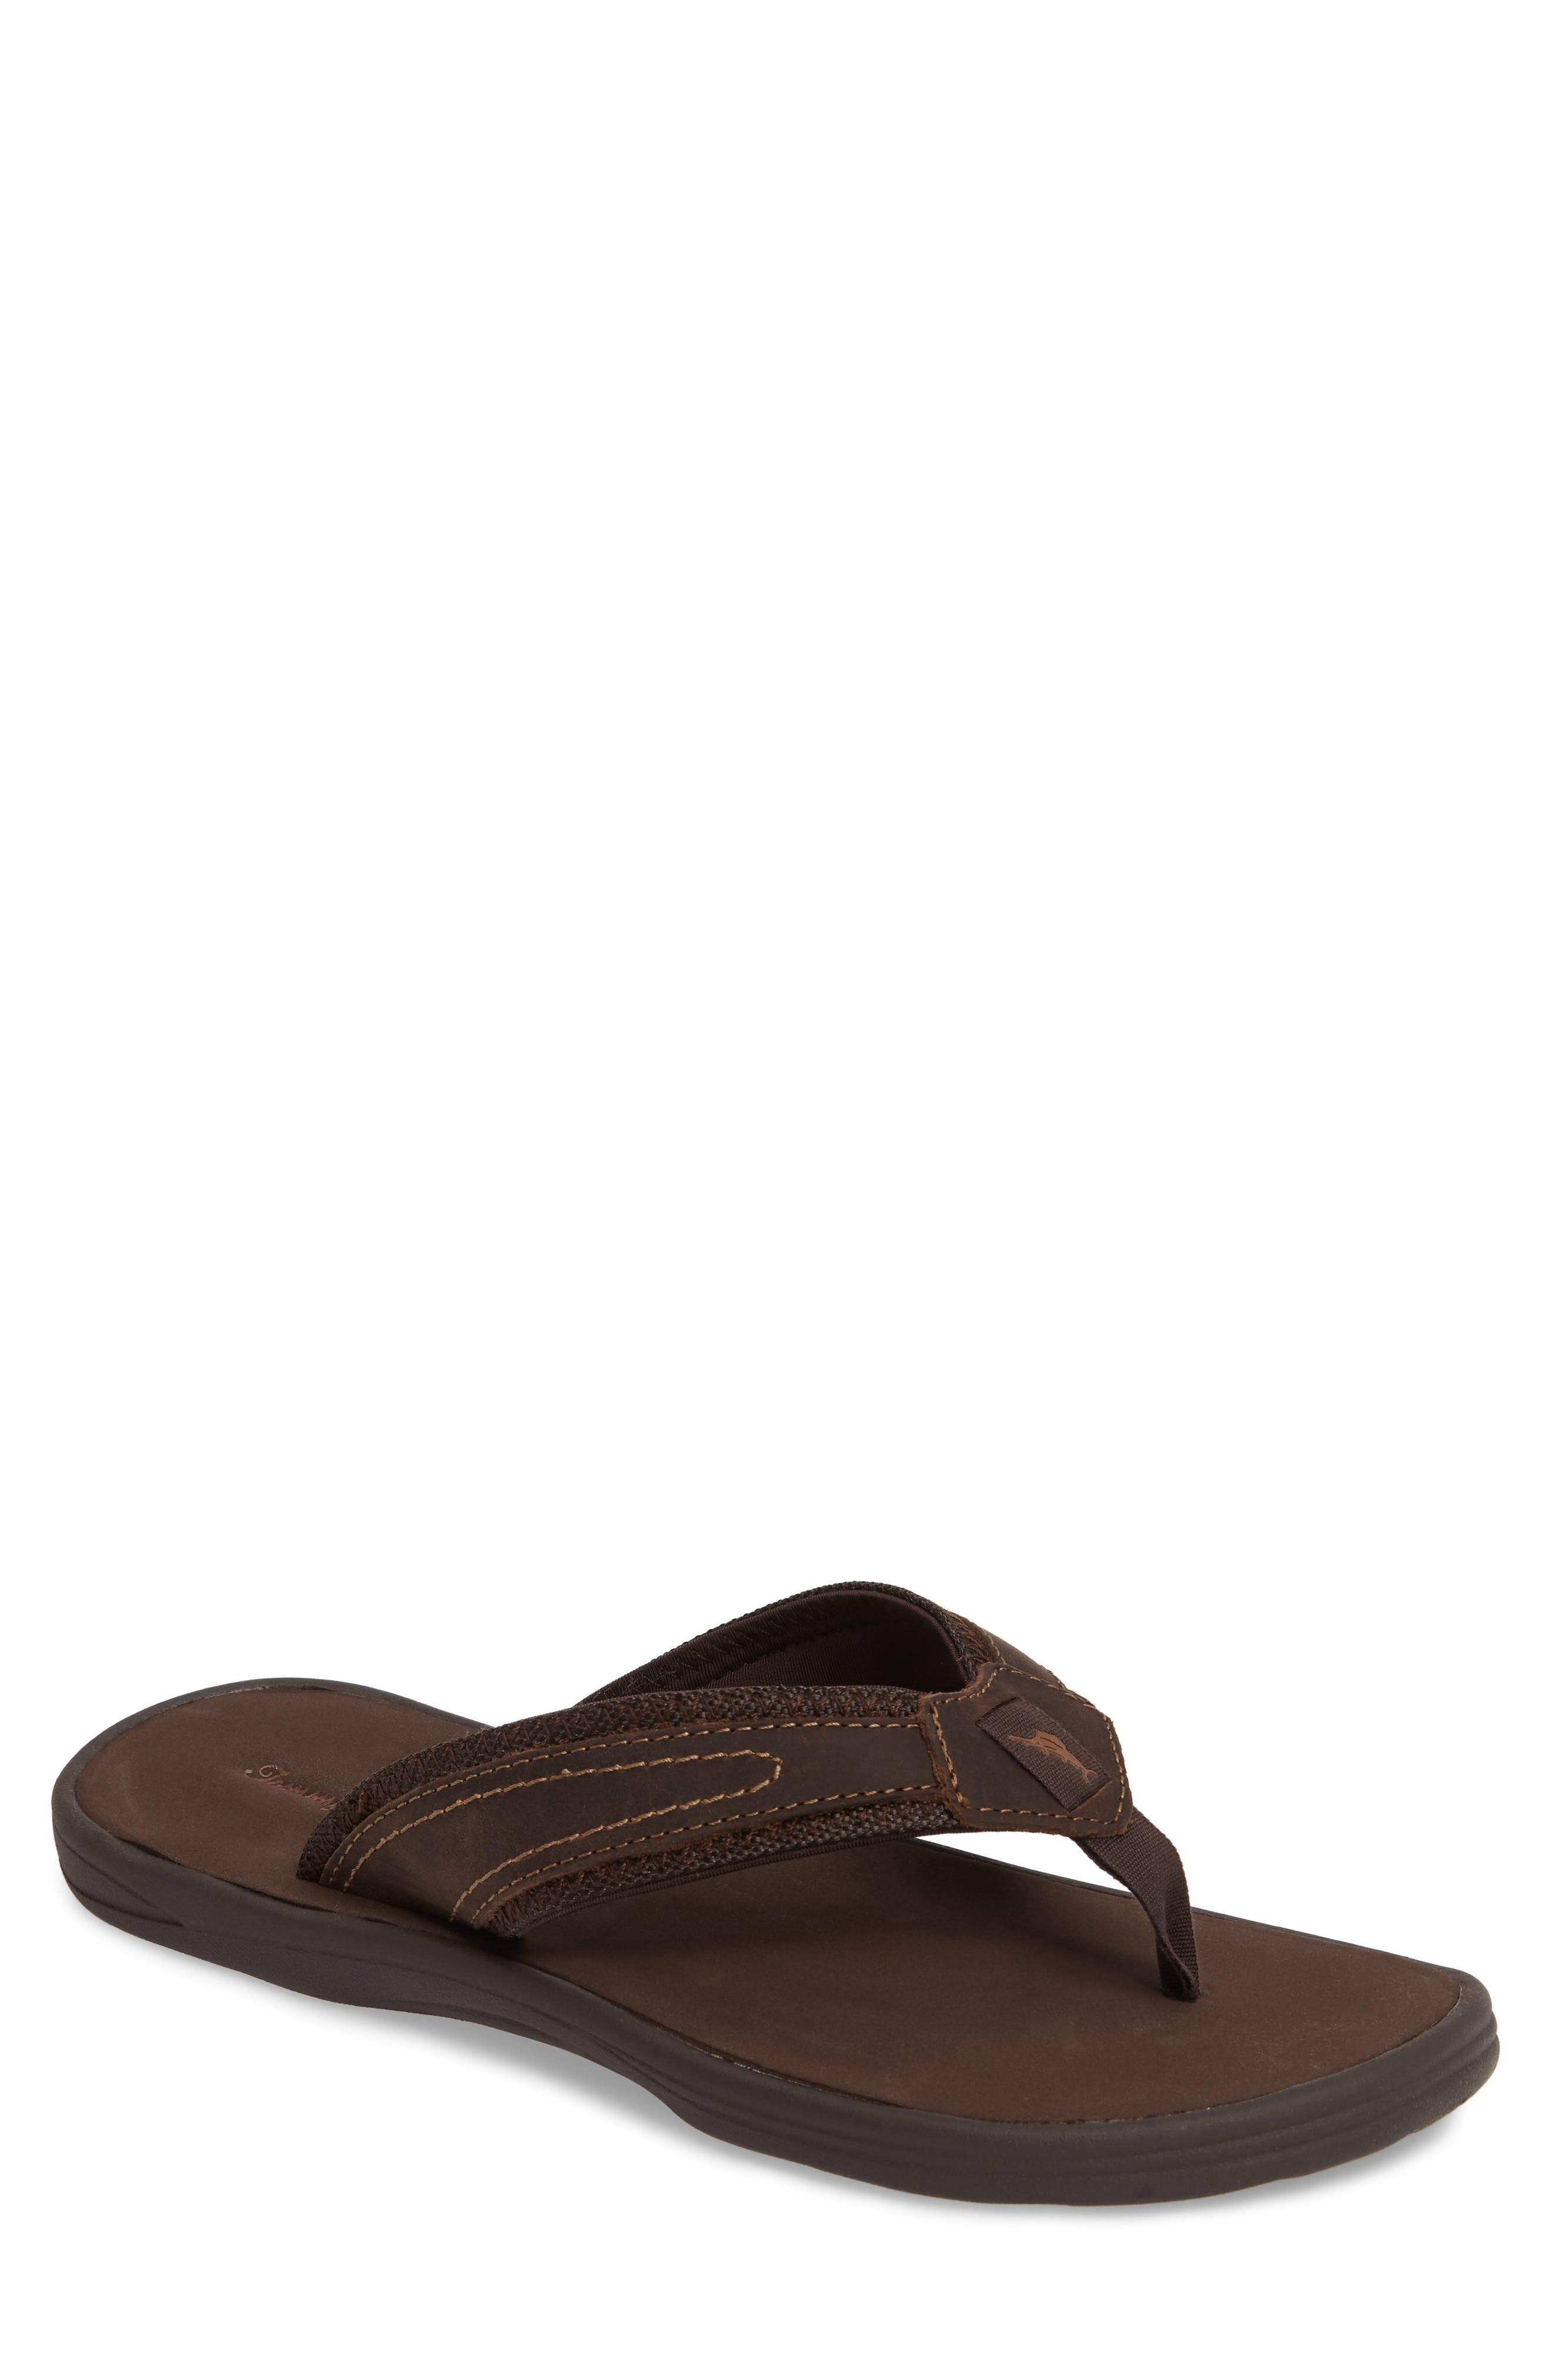 Seawell Flip Flop,                         Main,                         color, Dark Brown Leather